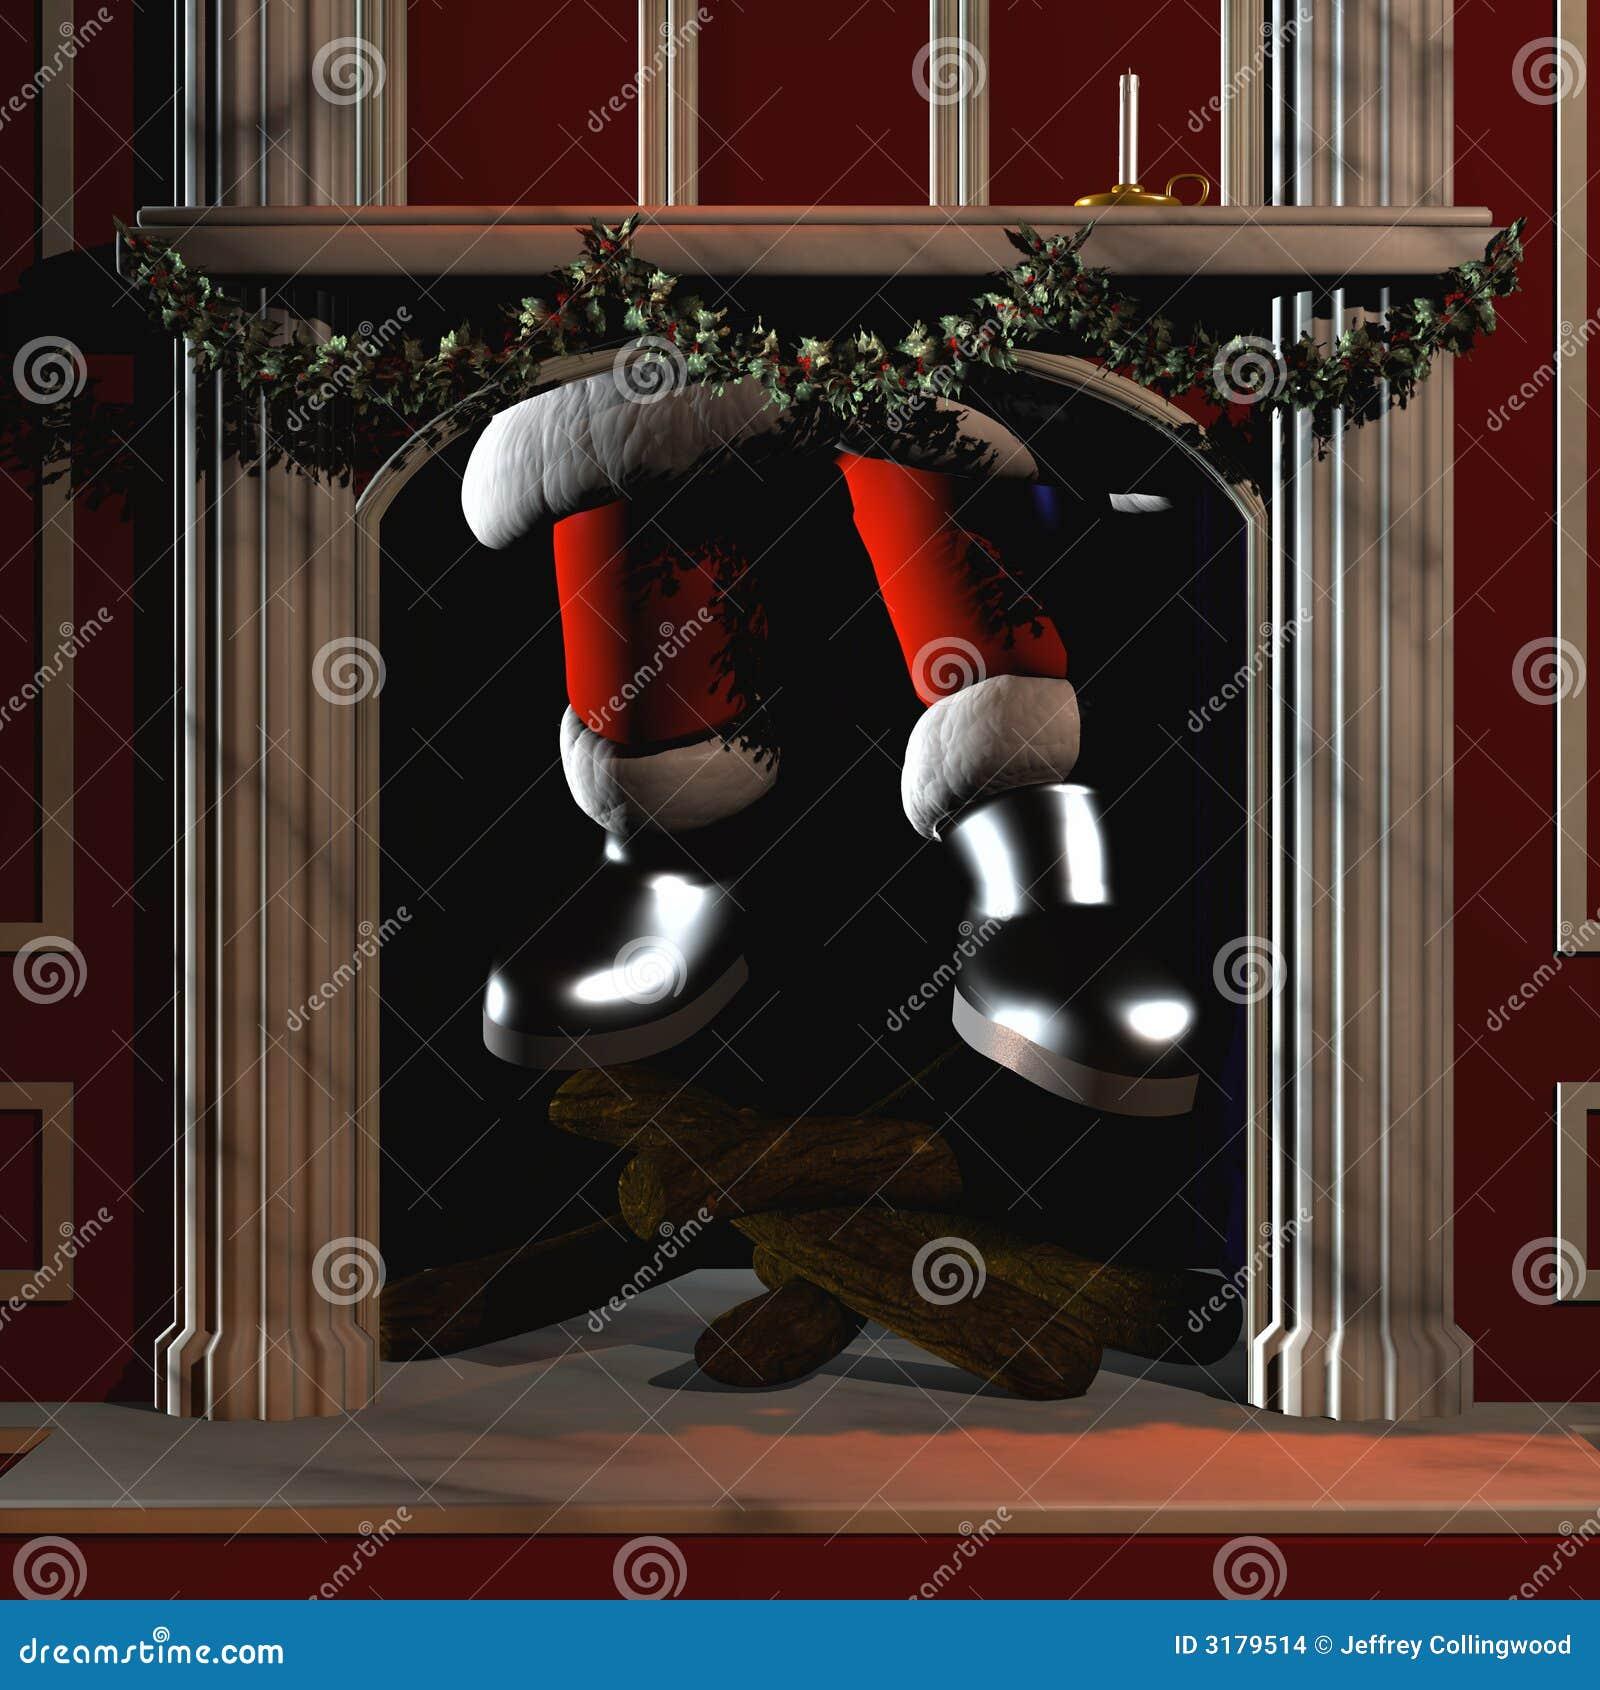 Santa Going Down Chimney 5 stock illustration ...